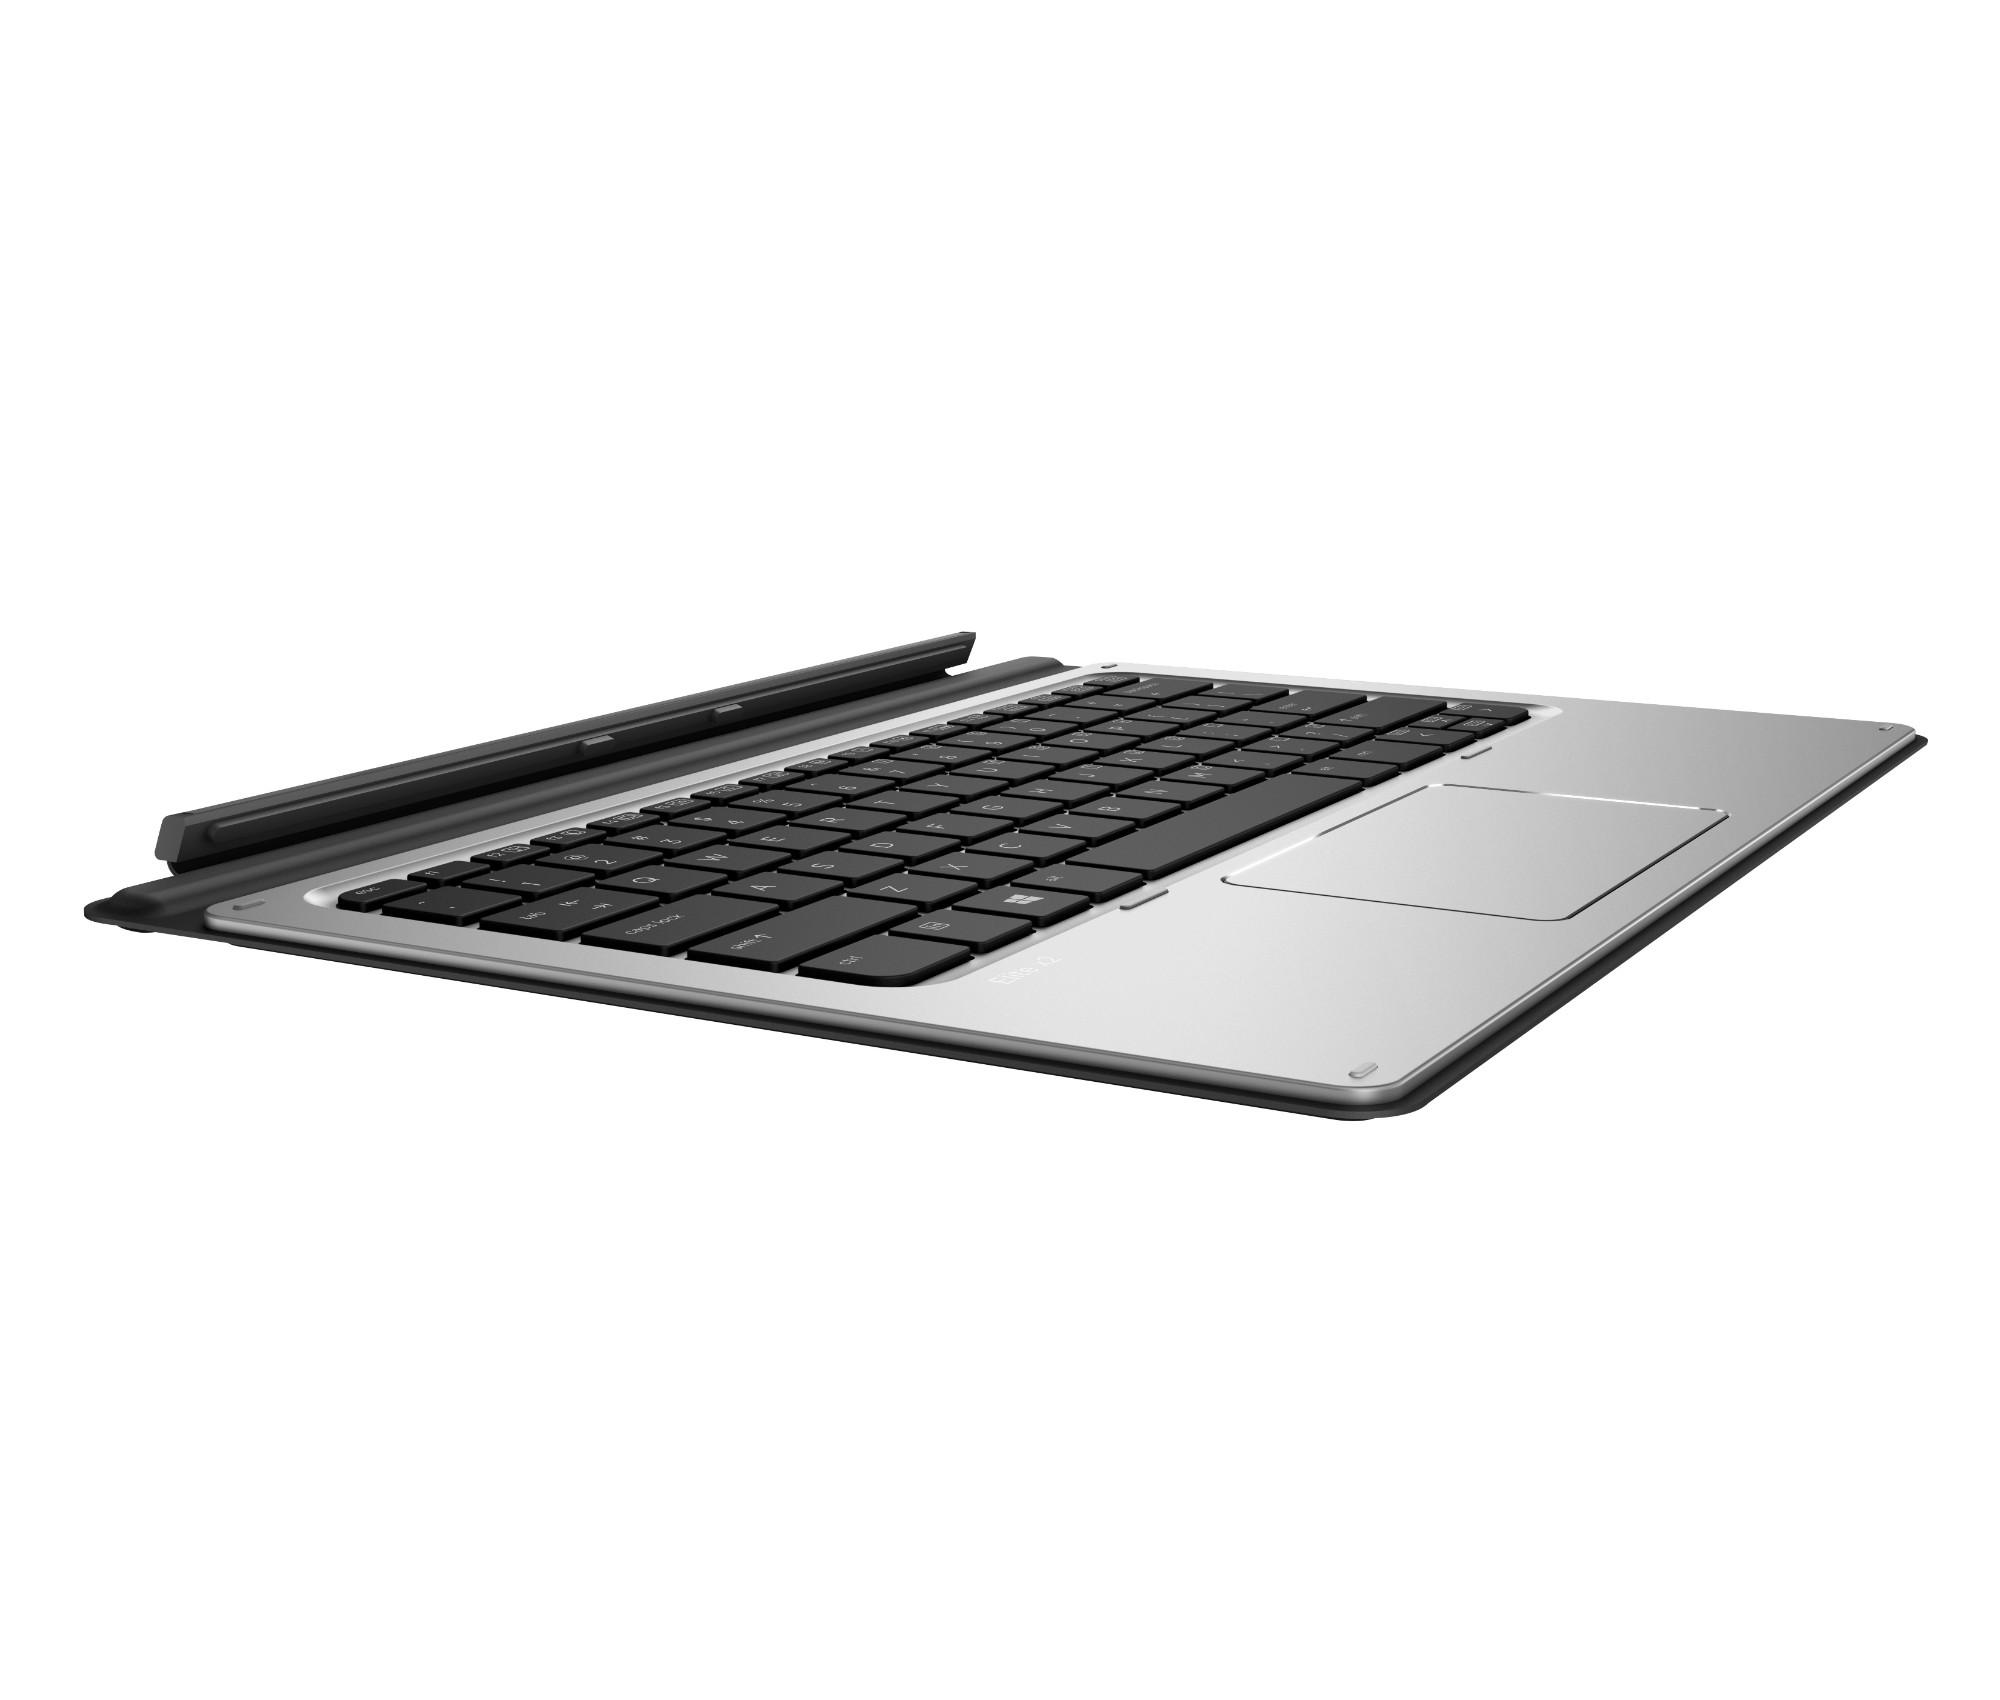 HP Elite x2 1012 Travel Keyboard